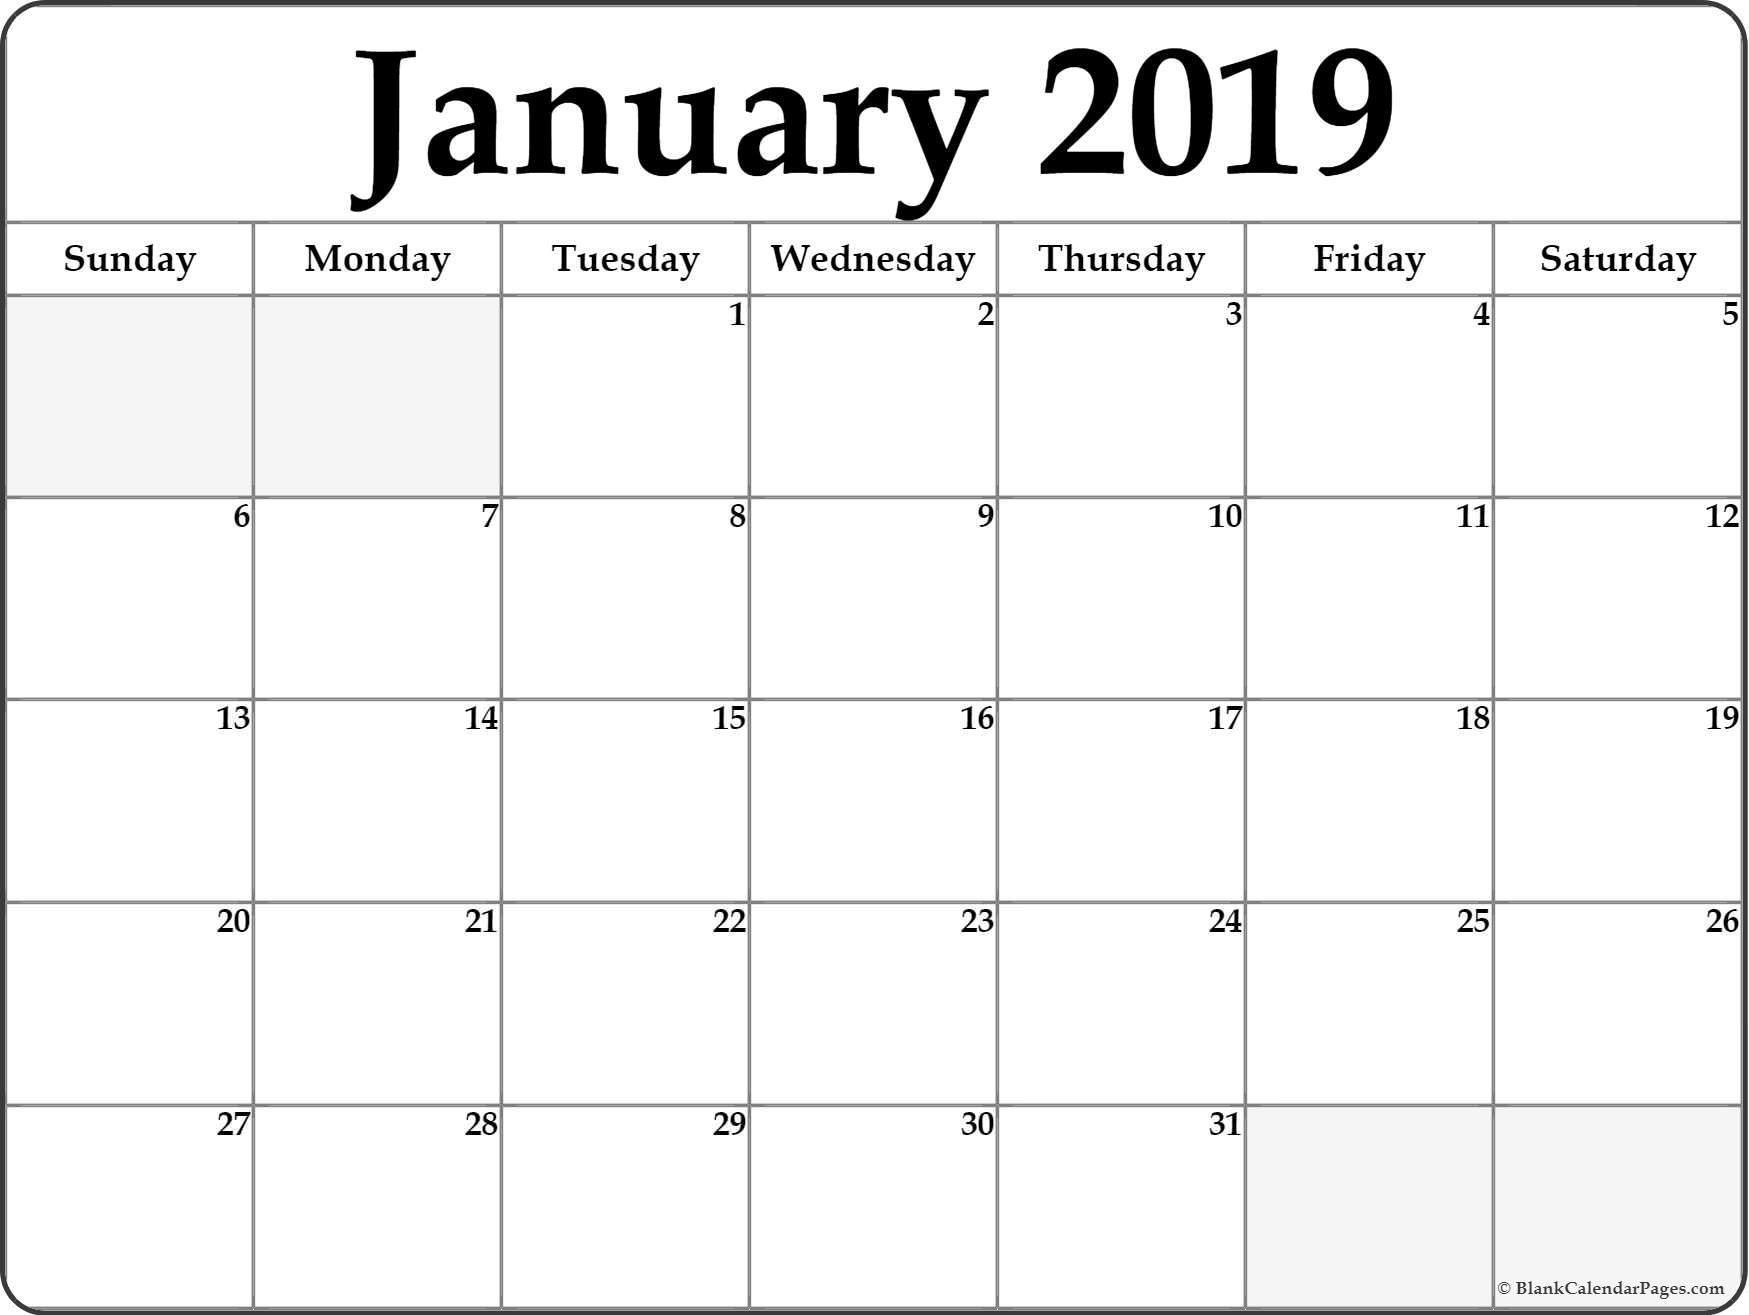 January 2019 Calendar   Free Printable Monthly Calendars Extraordinary Blank Calendar Page No Datea